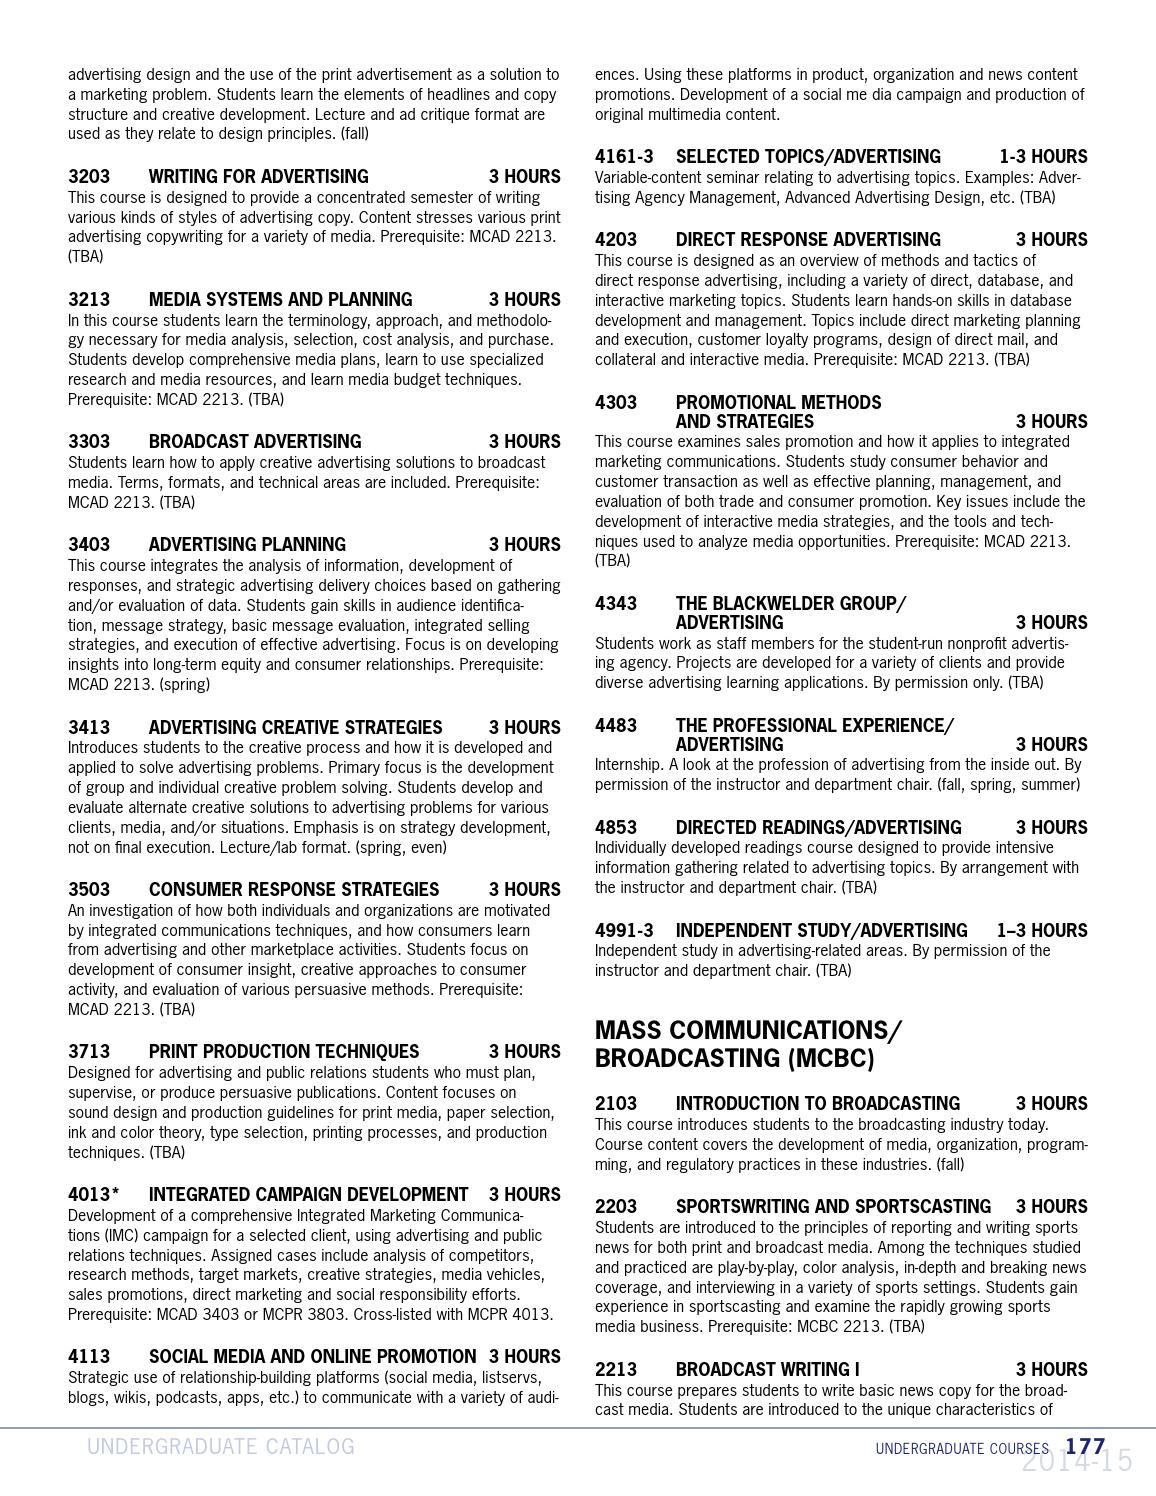 Oklahoma City University Undergraduate Catalog 2014 2015 By Oklahoma City University Issuu